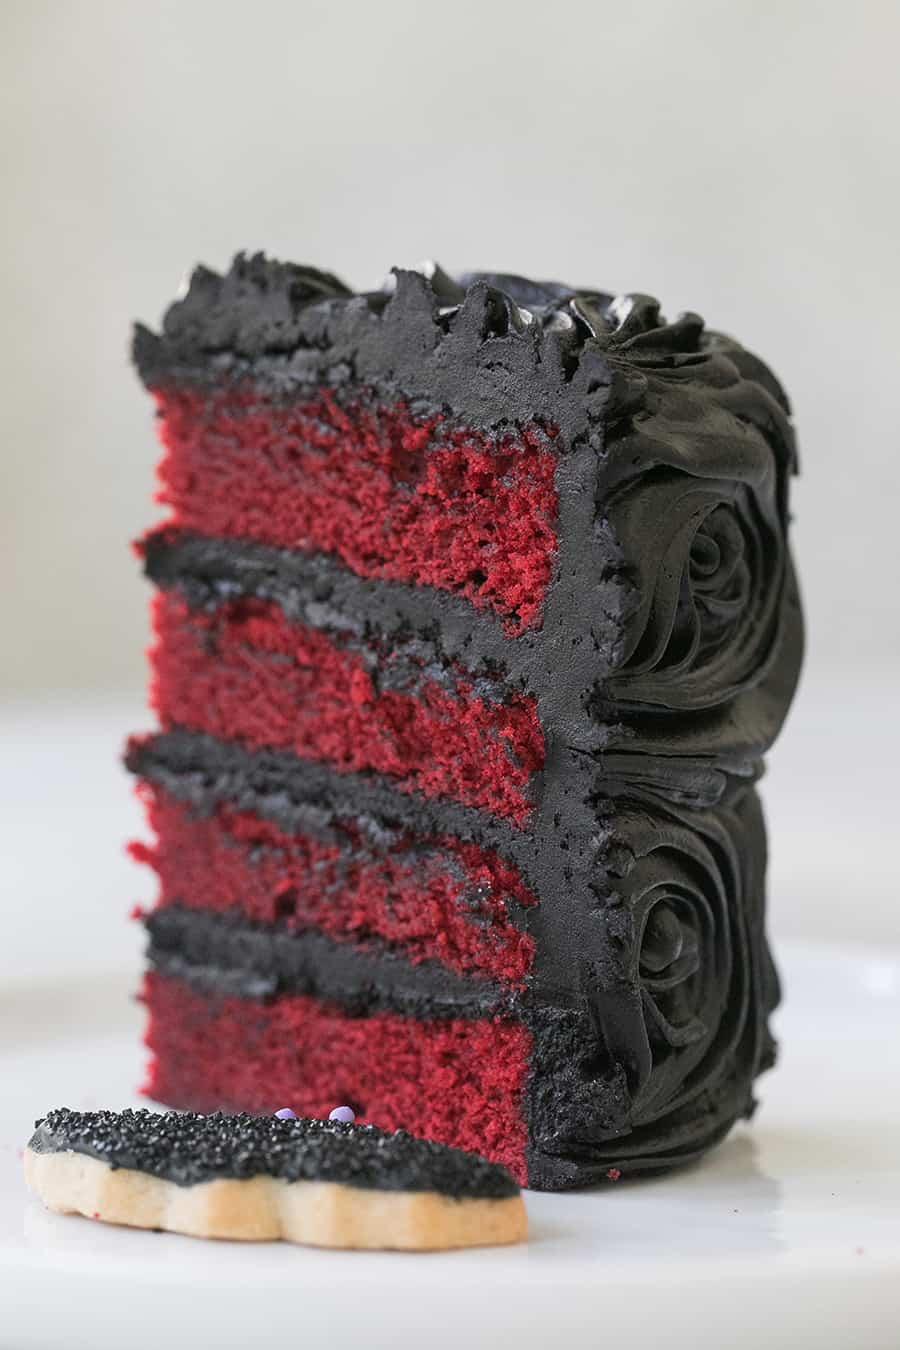 shot of slice of cake